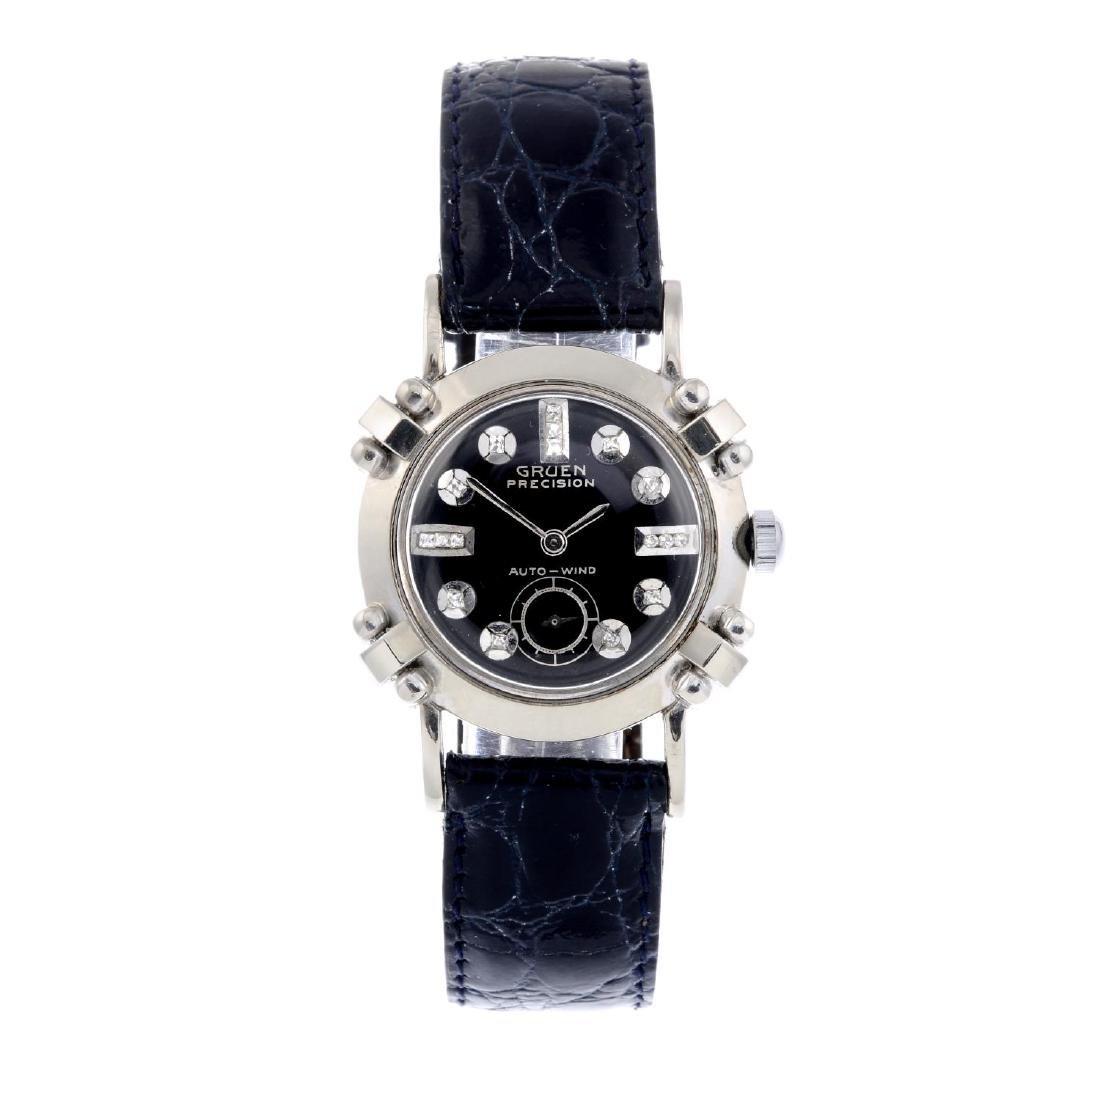 GRUEN - a lady's wrist watch. White metal case, stamped